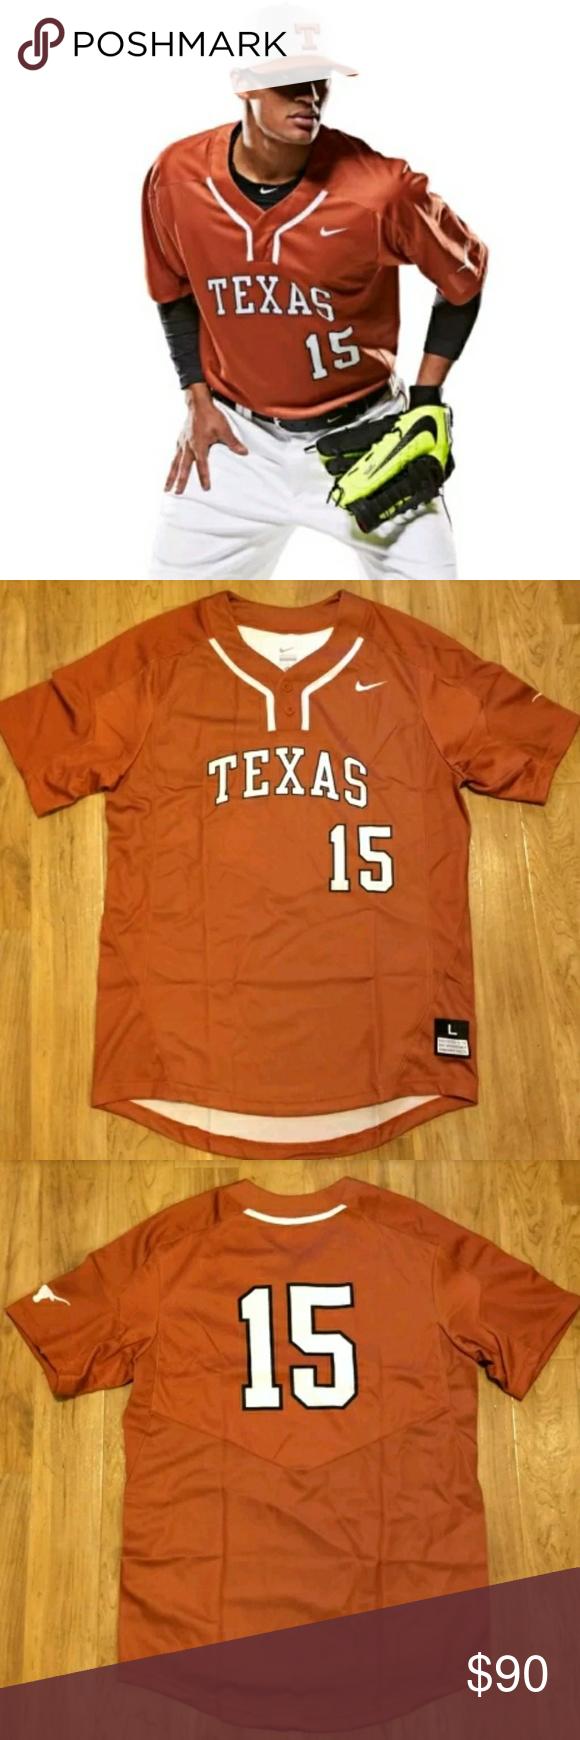 buy popular 089d4 cc9a9 Nike Texas Longhorns Baseball Jersey 2-button Texas ...